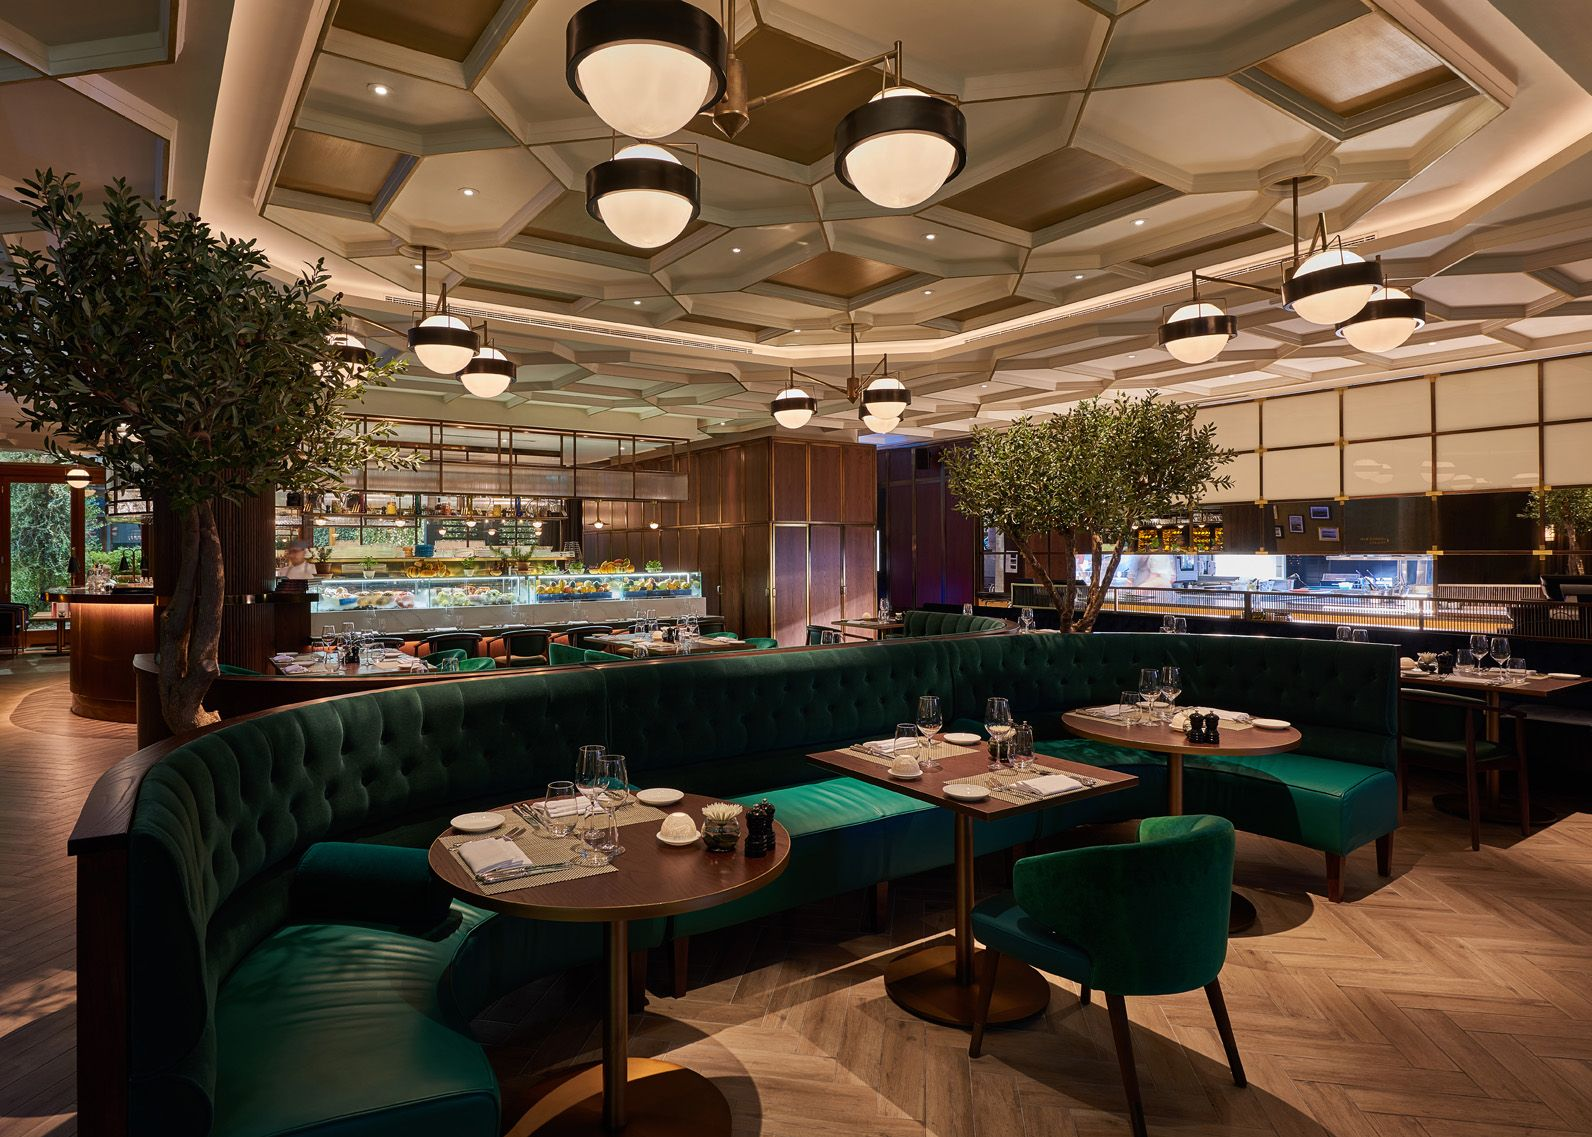 galvin dubai dubai restaurant interior design branding by rh pinterest com